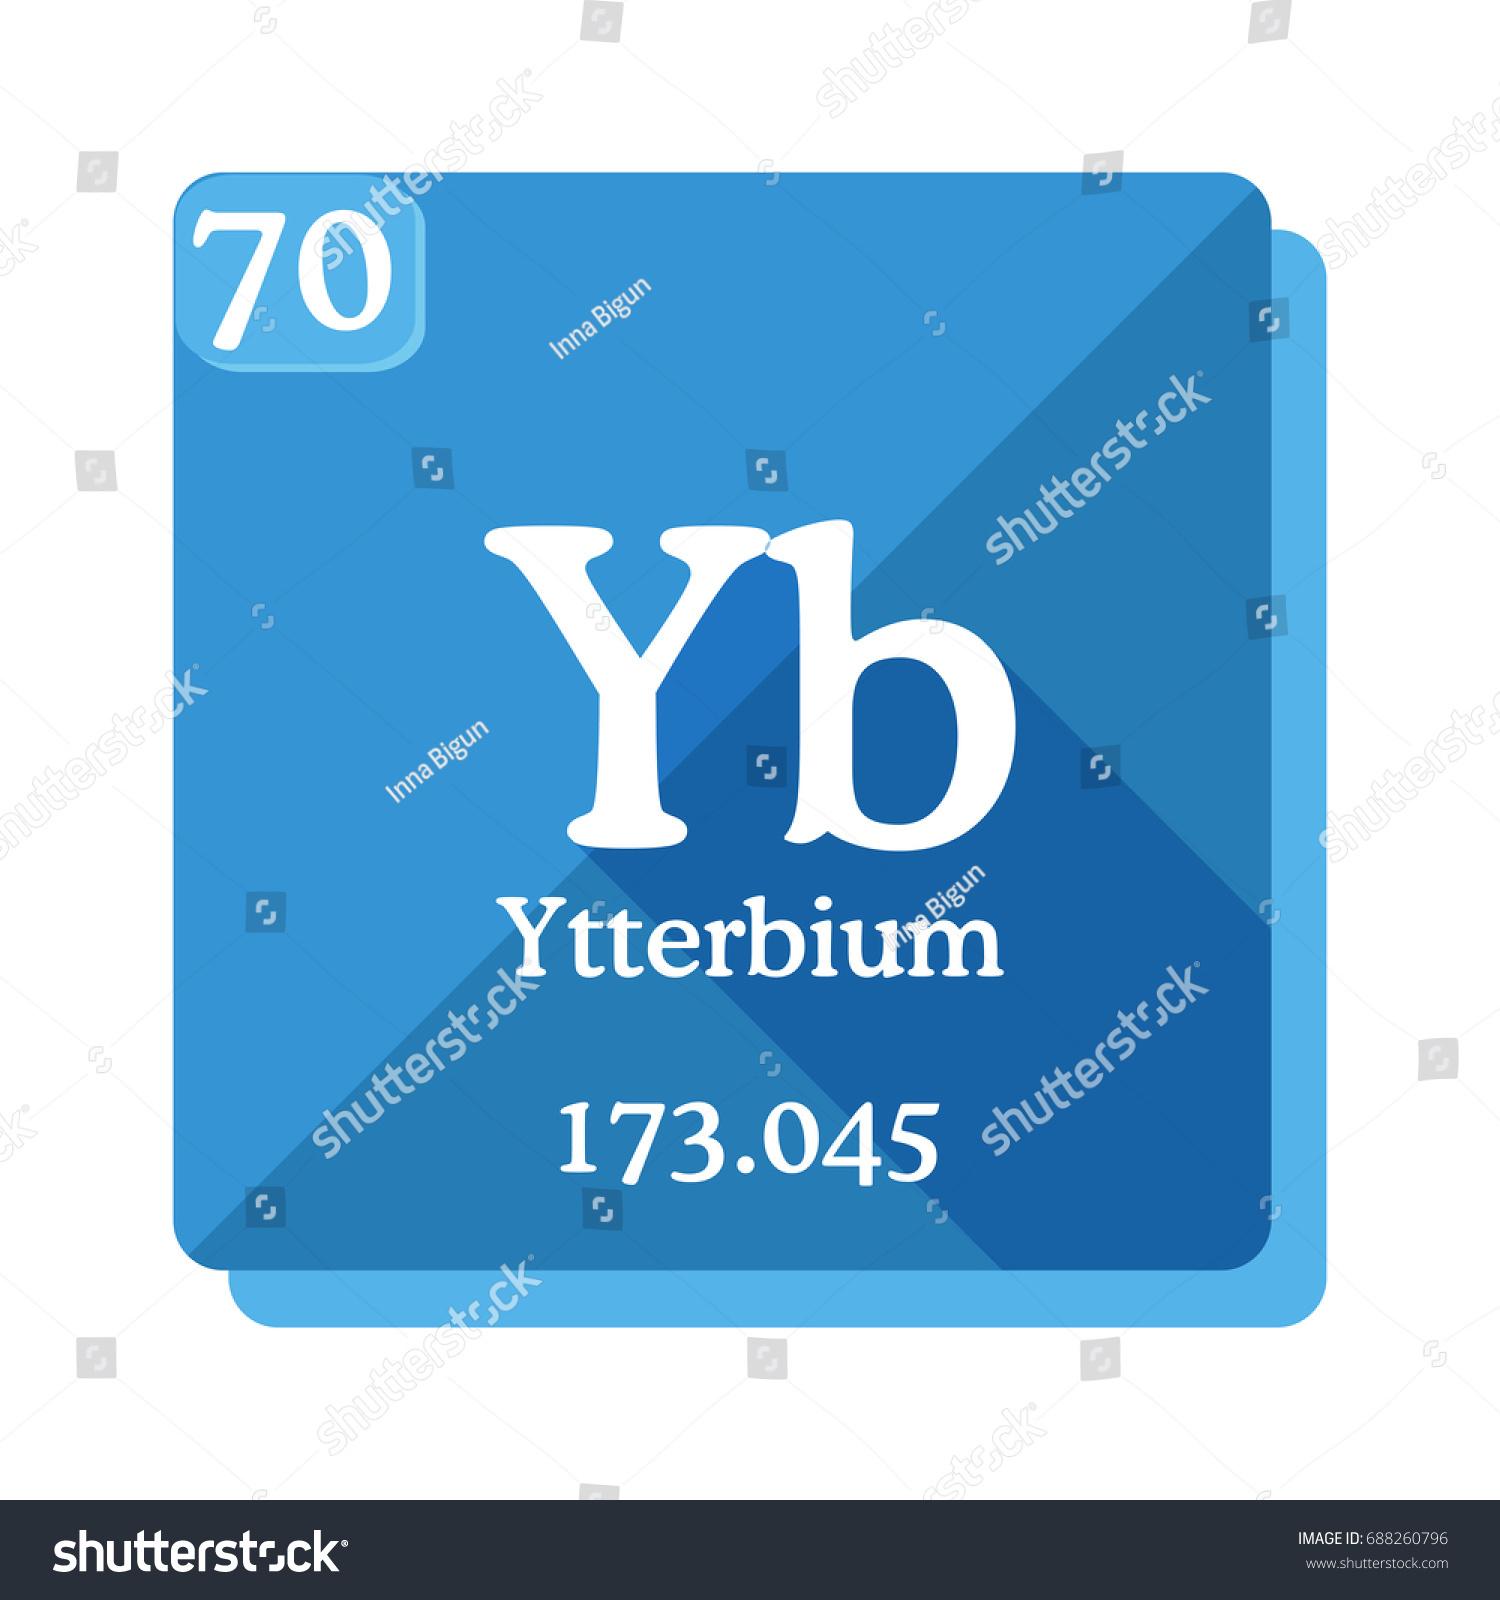 Ytterbium yb element periodic table vector stock vector hd royalty ytterbium yb element of the periodic table vector illustration in flat style urtaz Choice Image